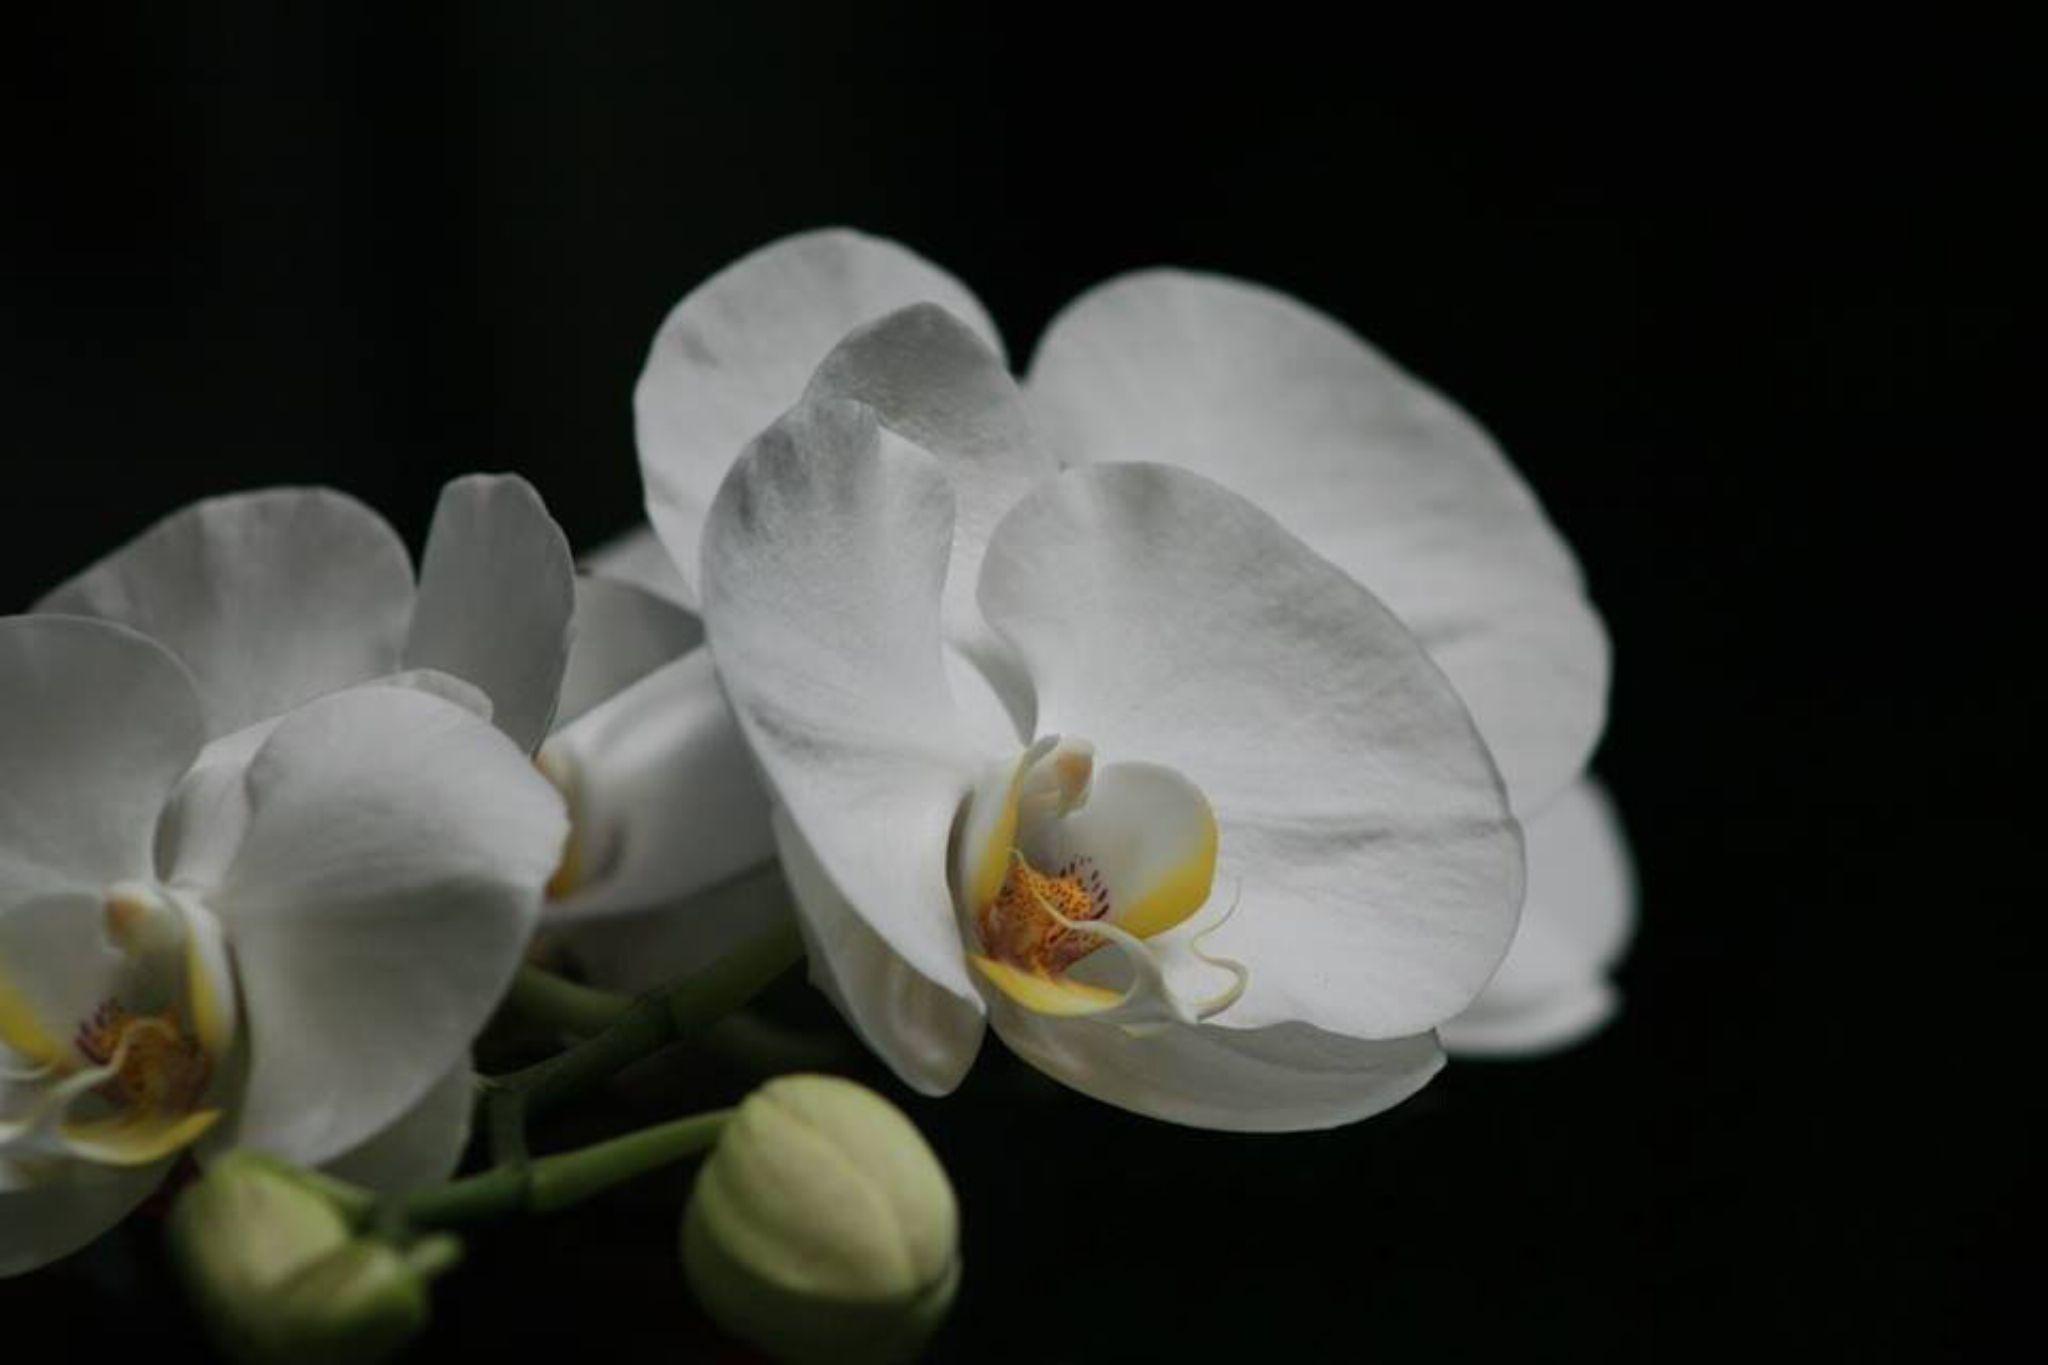 White Orchid by joshua mellen